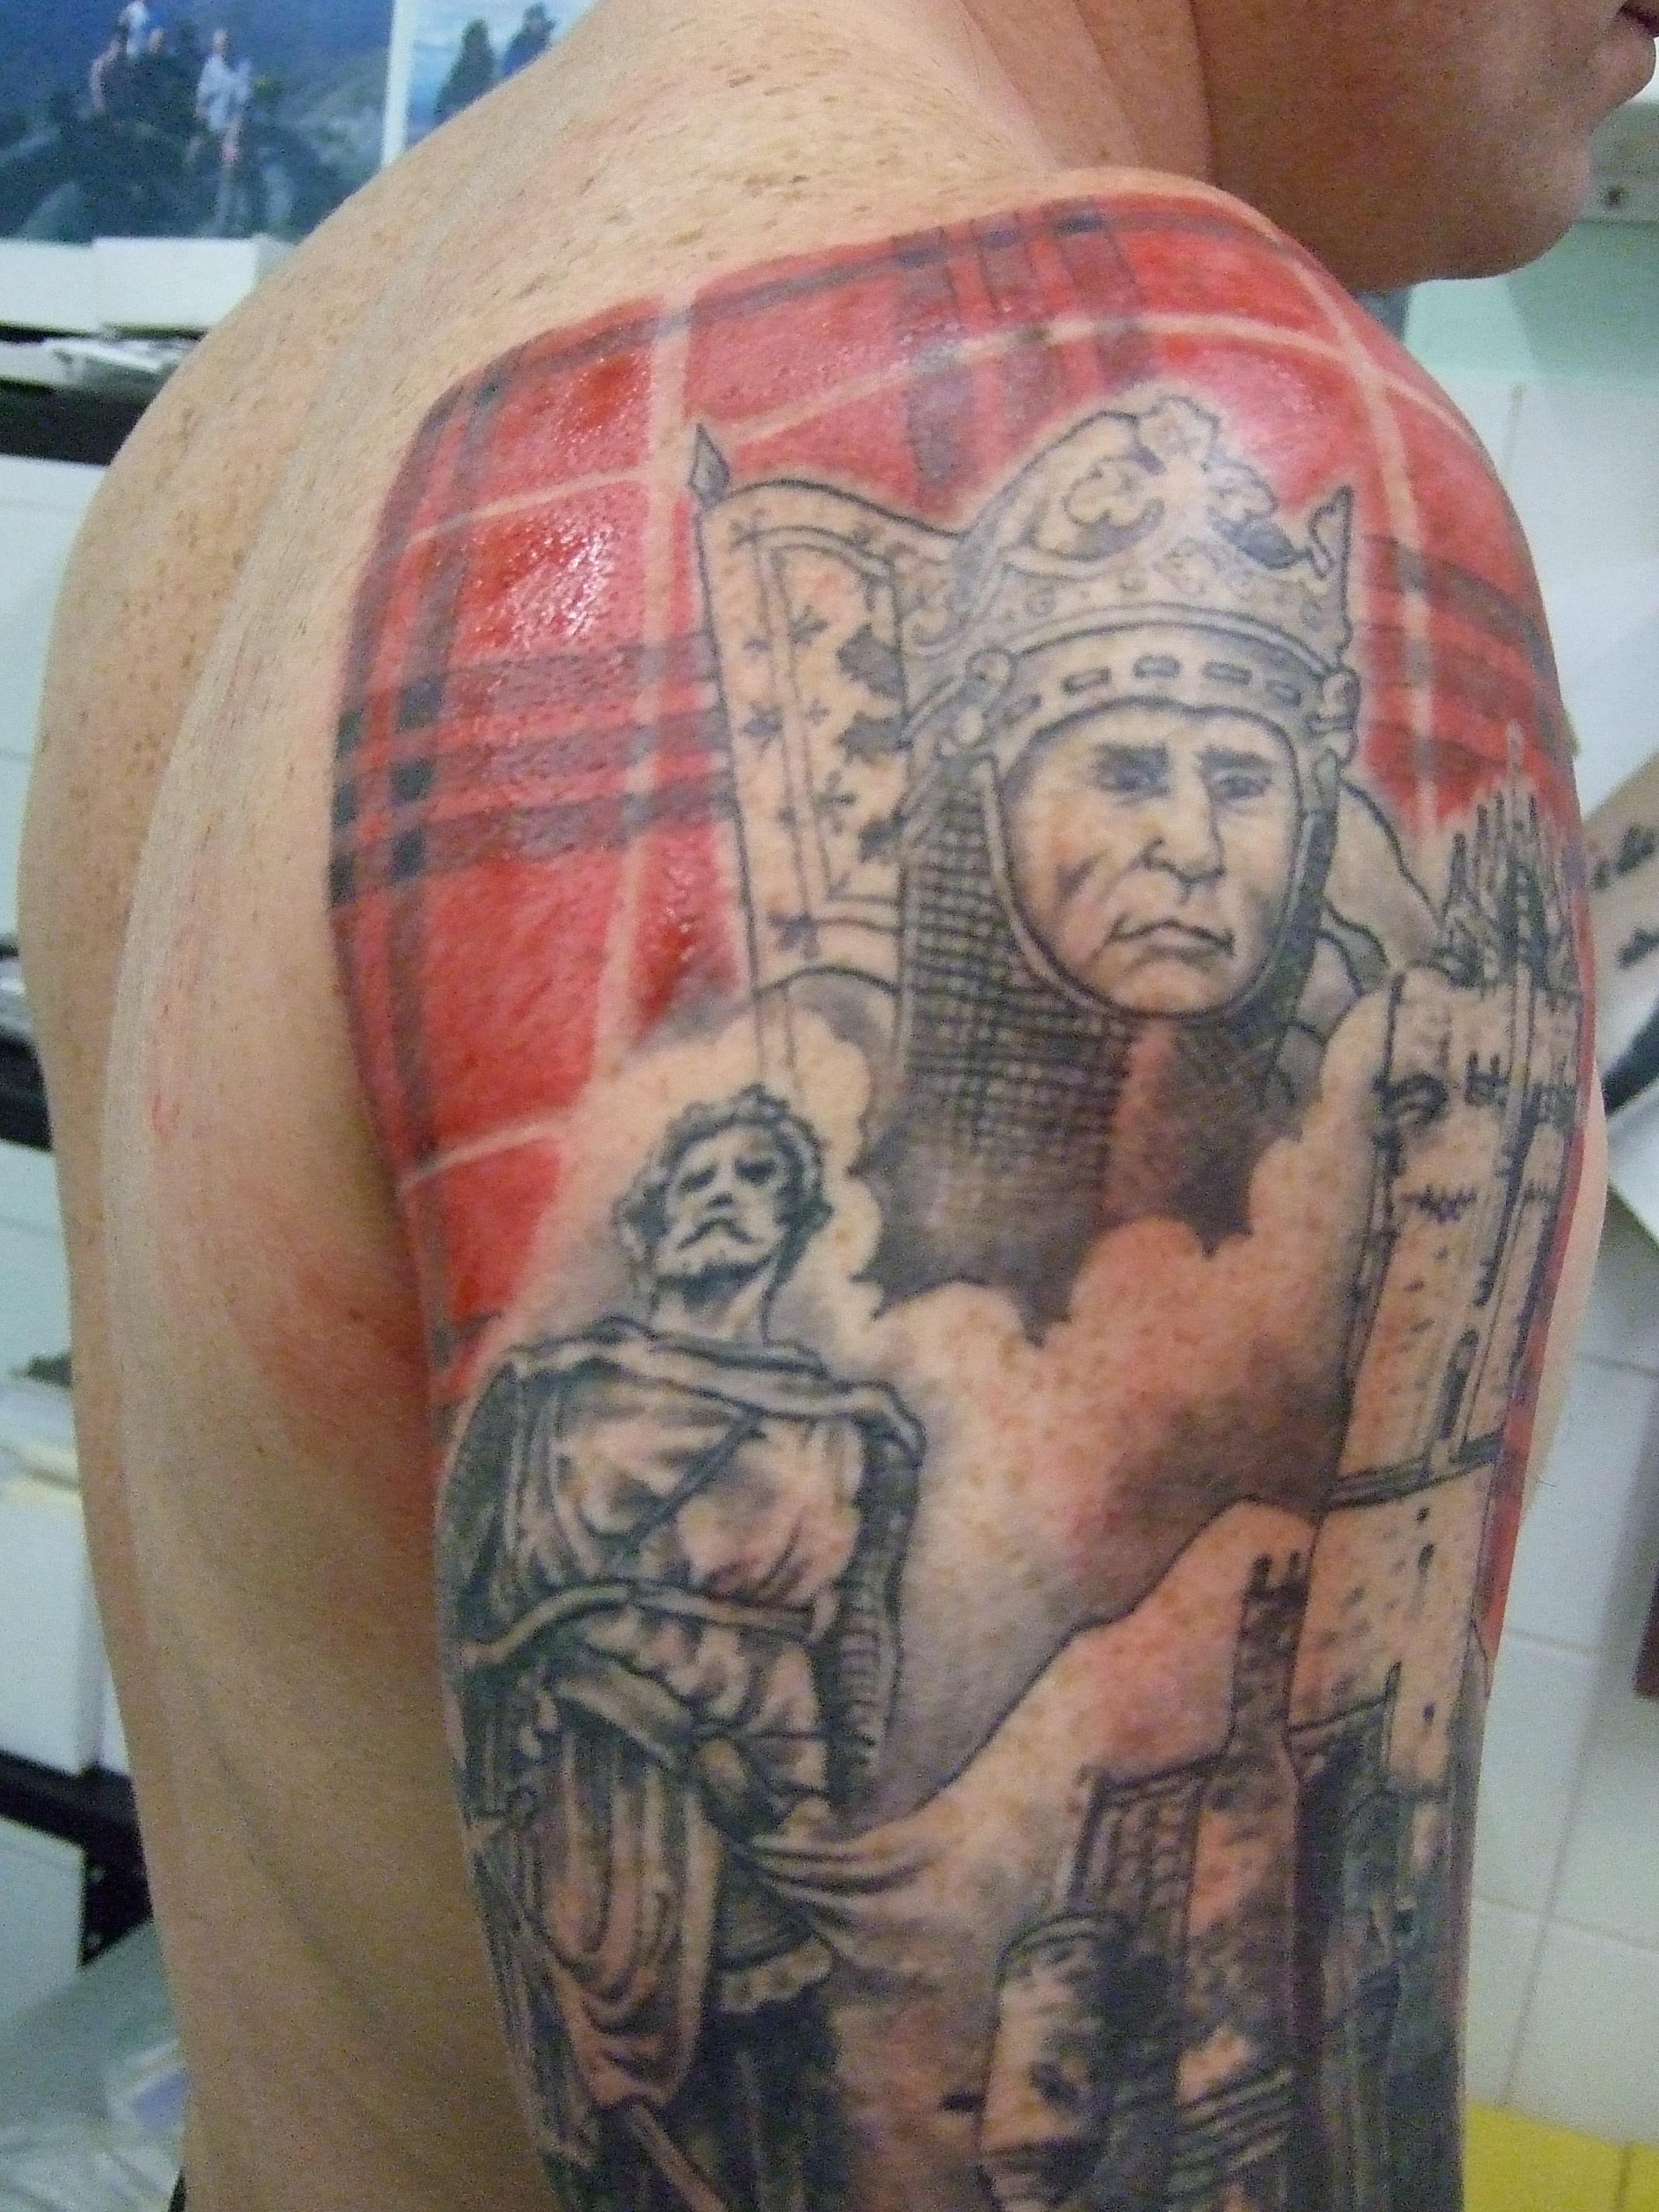 Home Asylum Tattoos